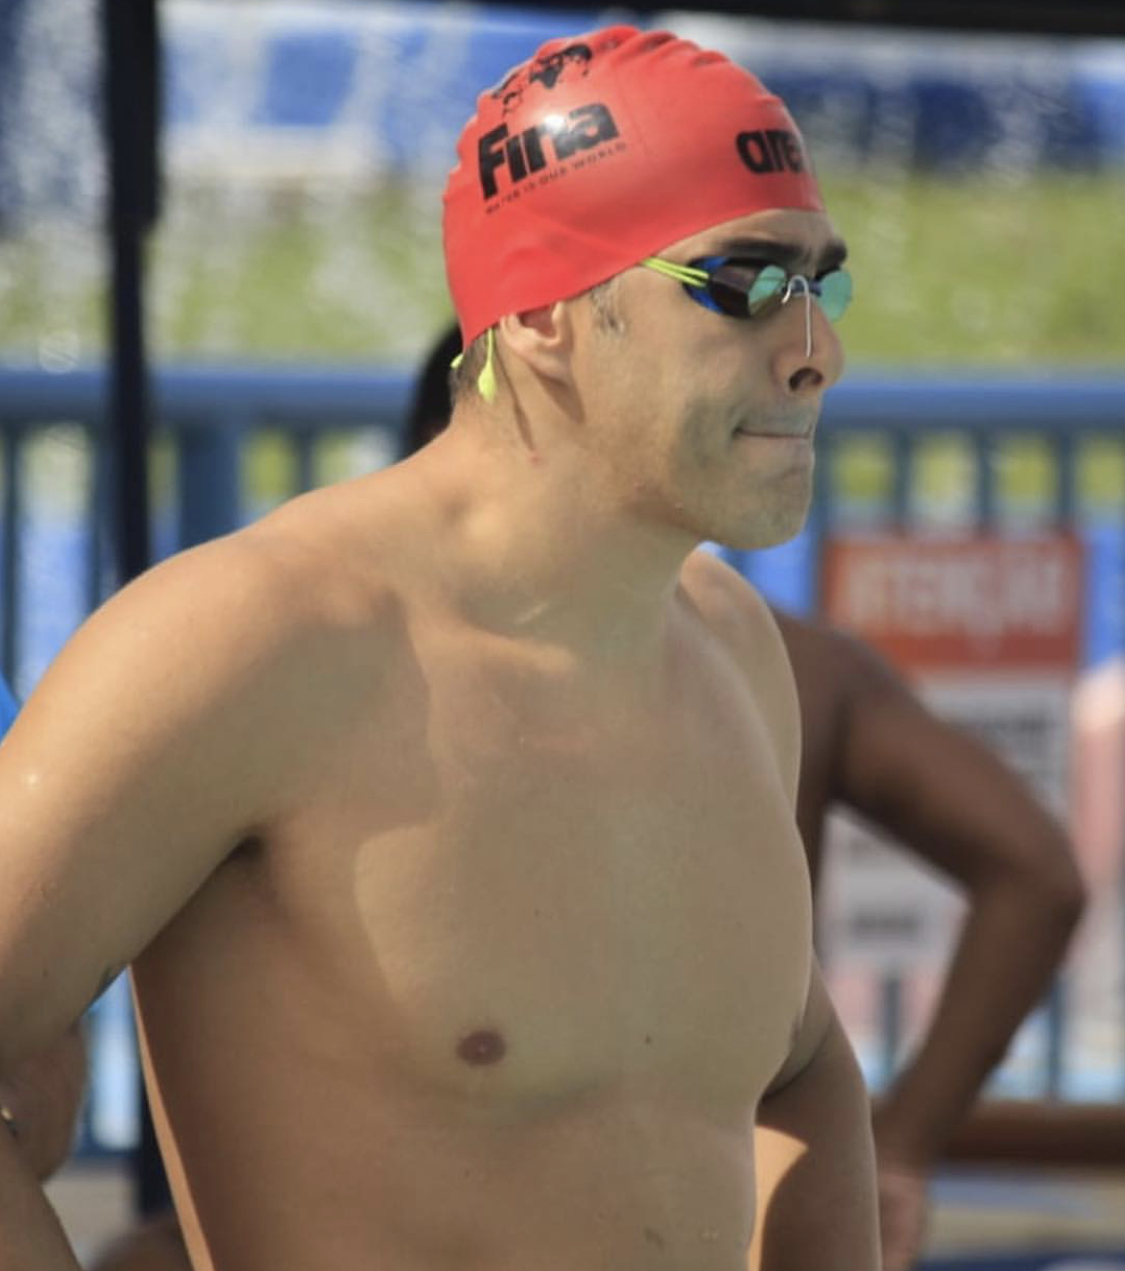 Top Brazilian Swimmer Seeking to Win in the US